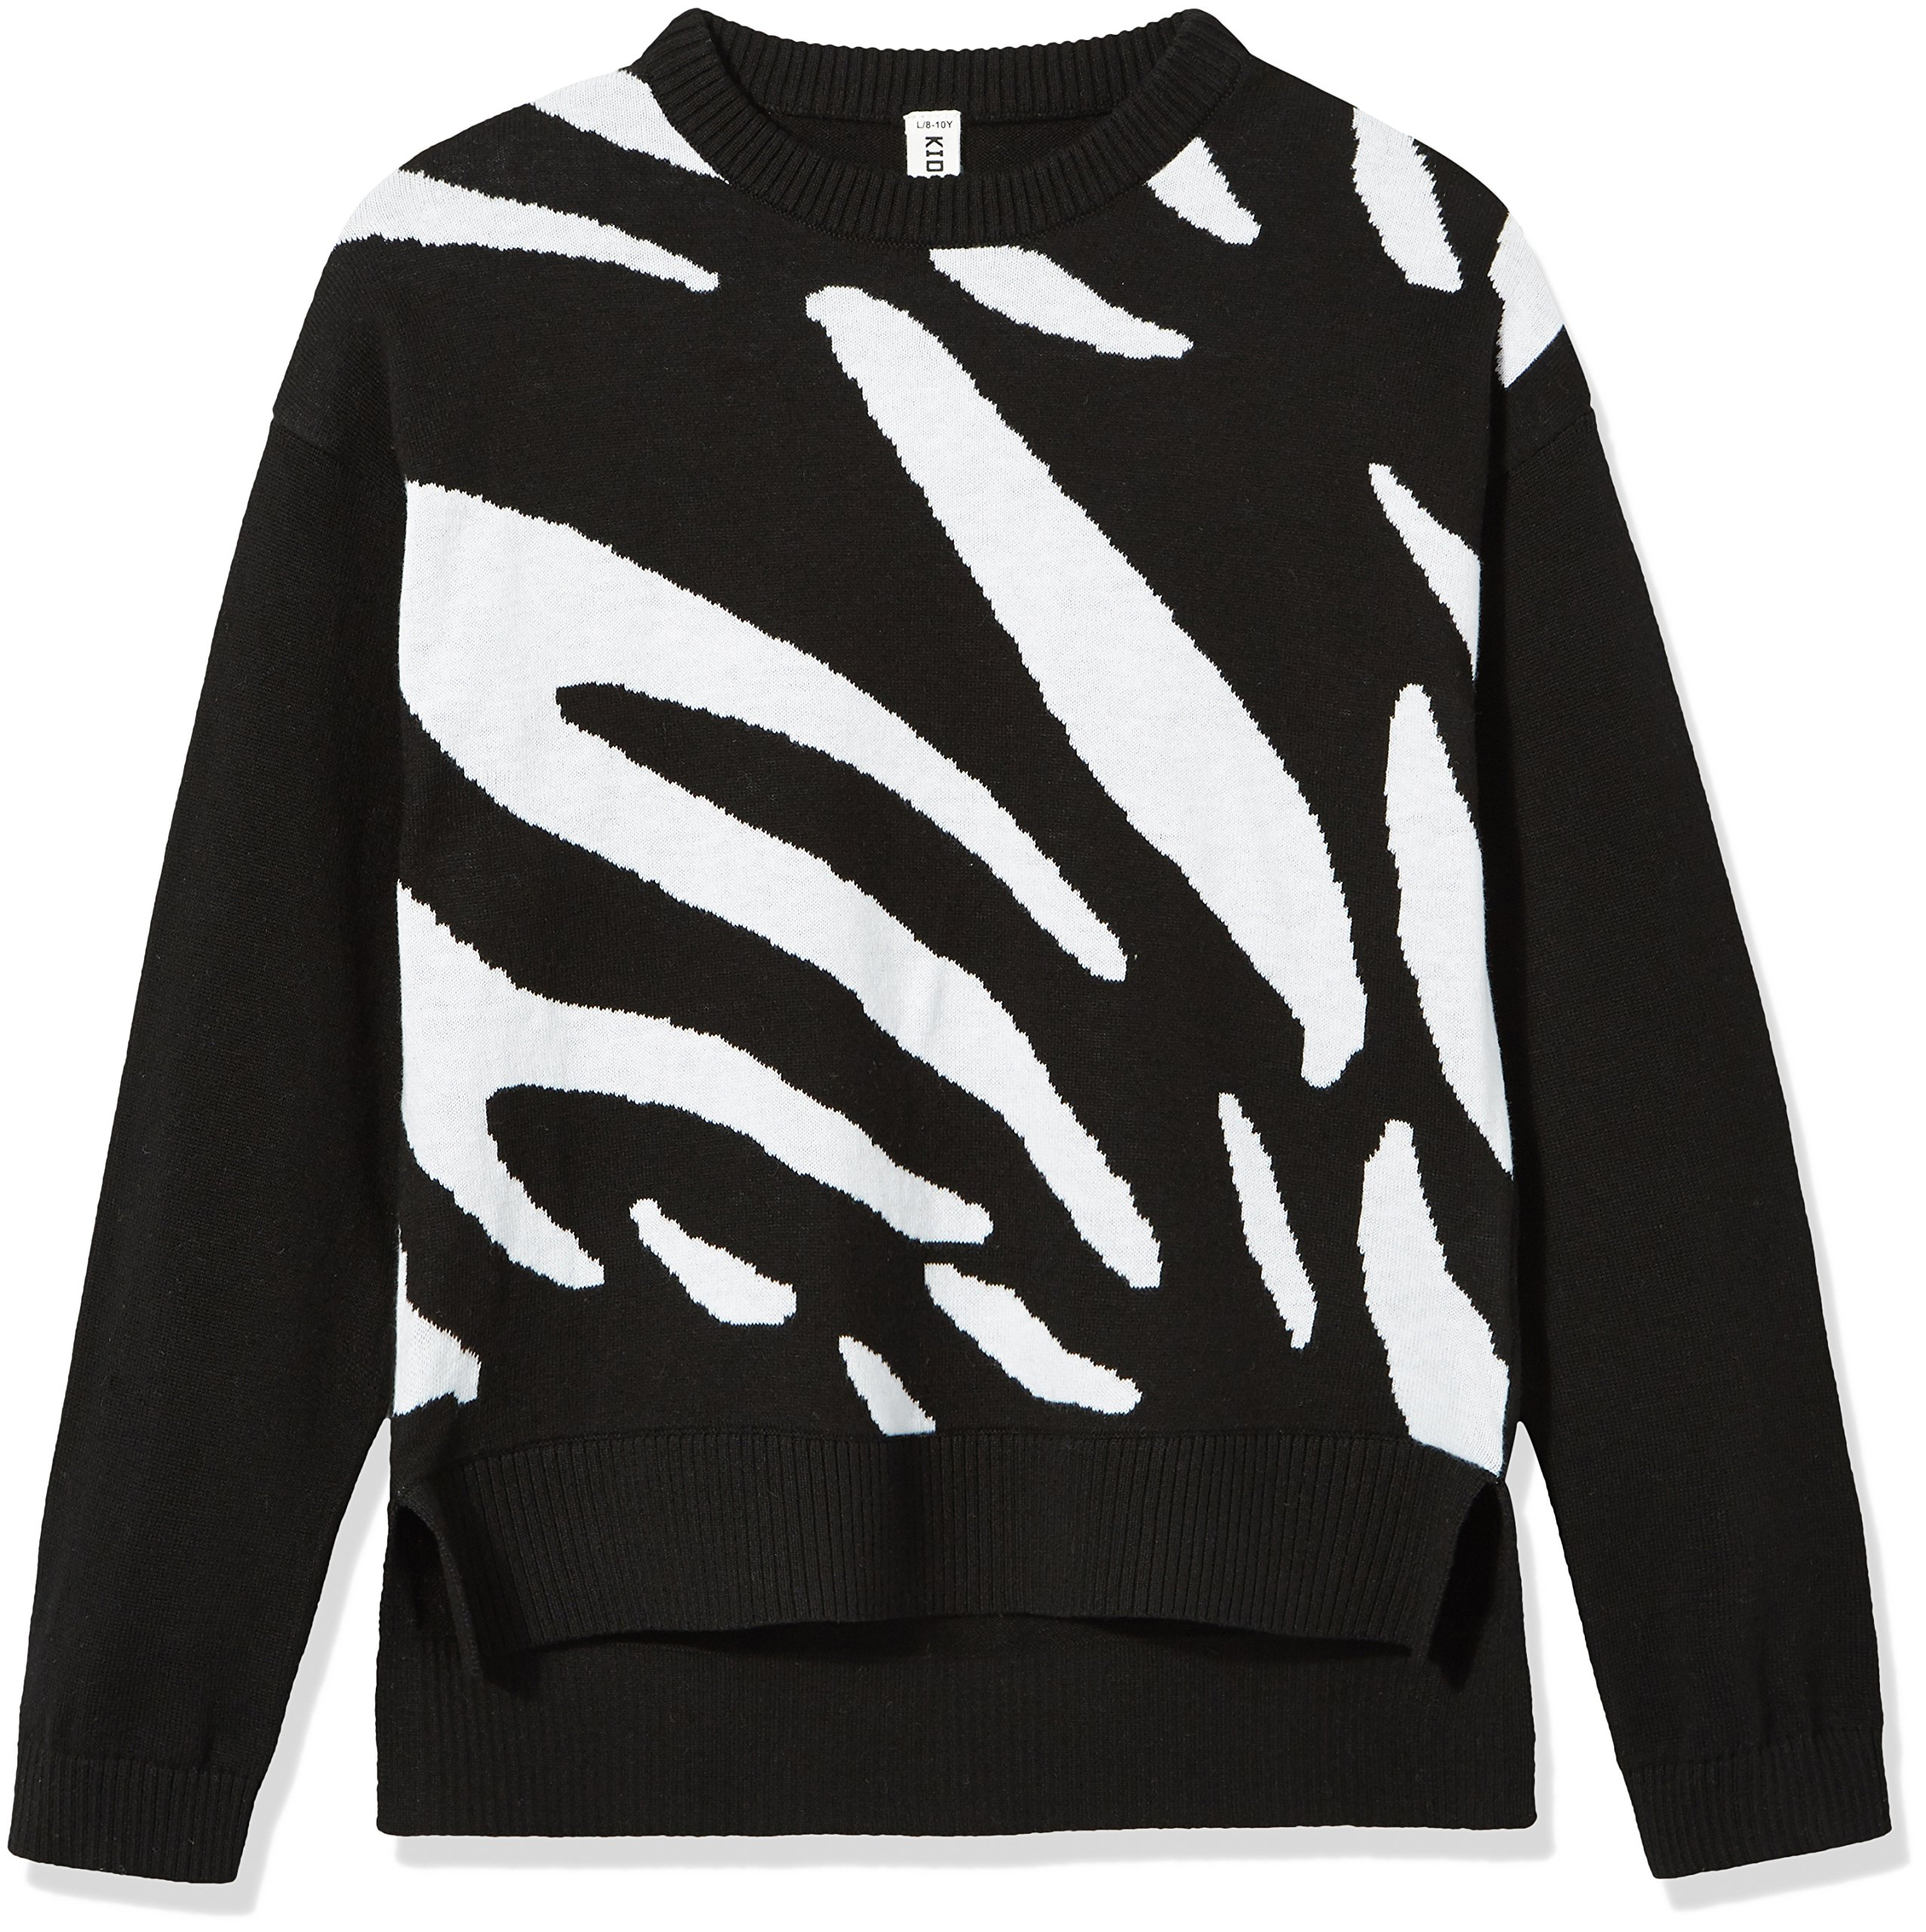 Kid Nation Girls' Long Sleeve Pullover Sweater L Black